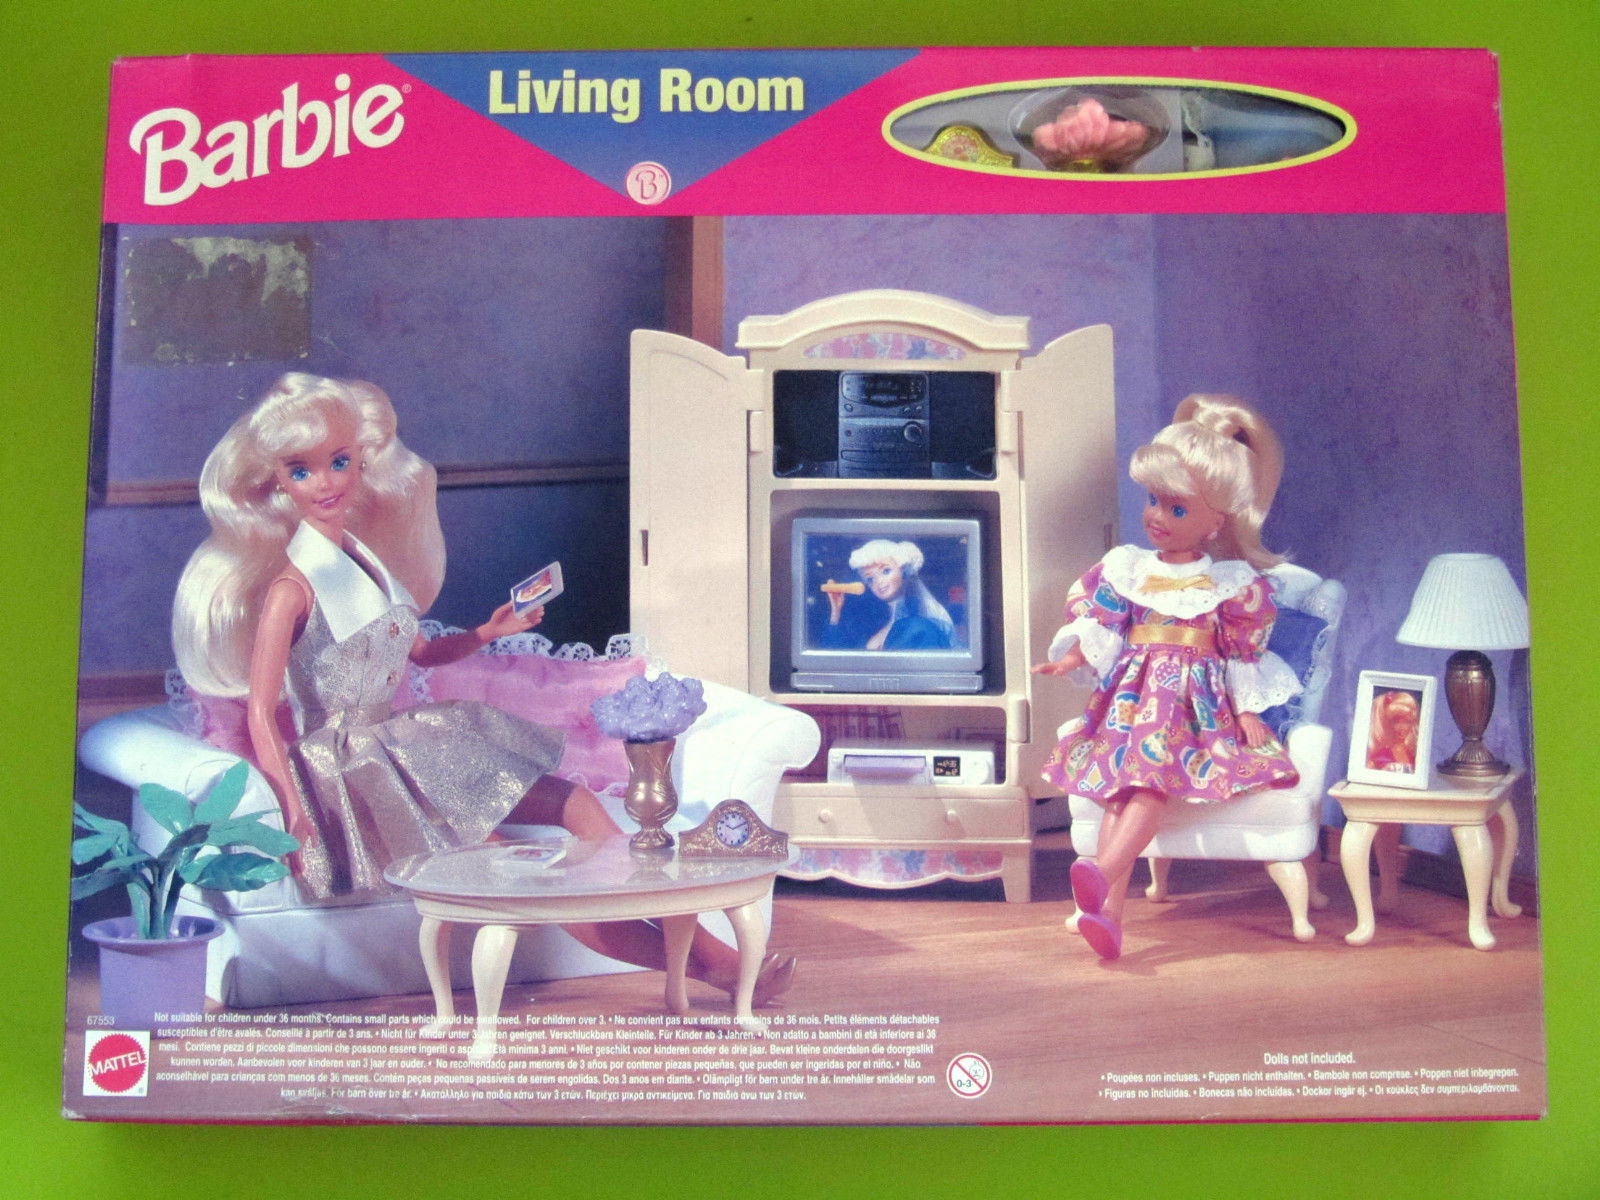 ... 1600 × 1200 Pixels. #7604 RARE NRFB Target Blue Box Barbie Living Room  Collection